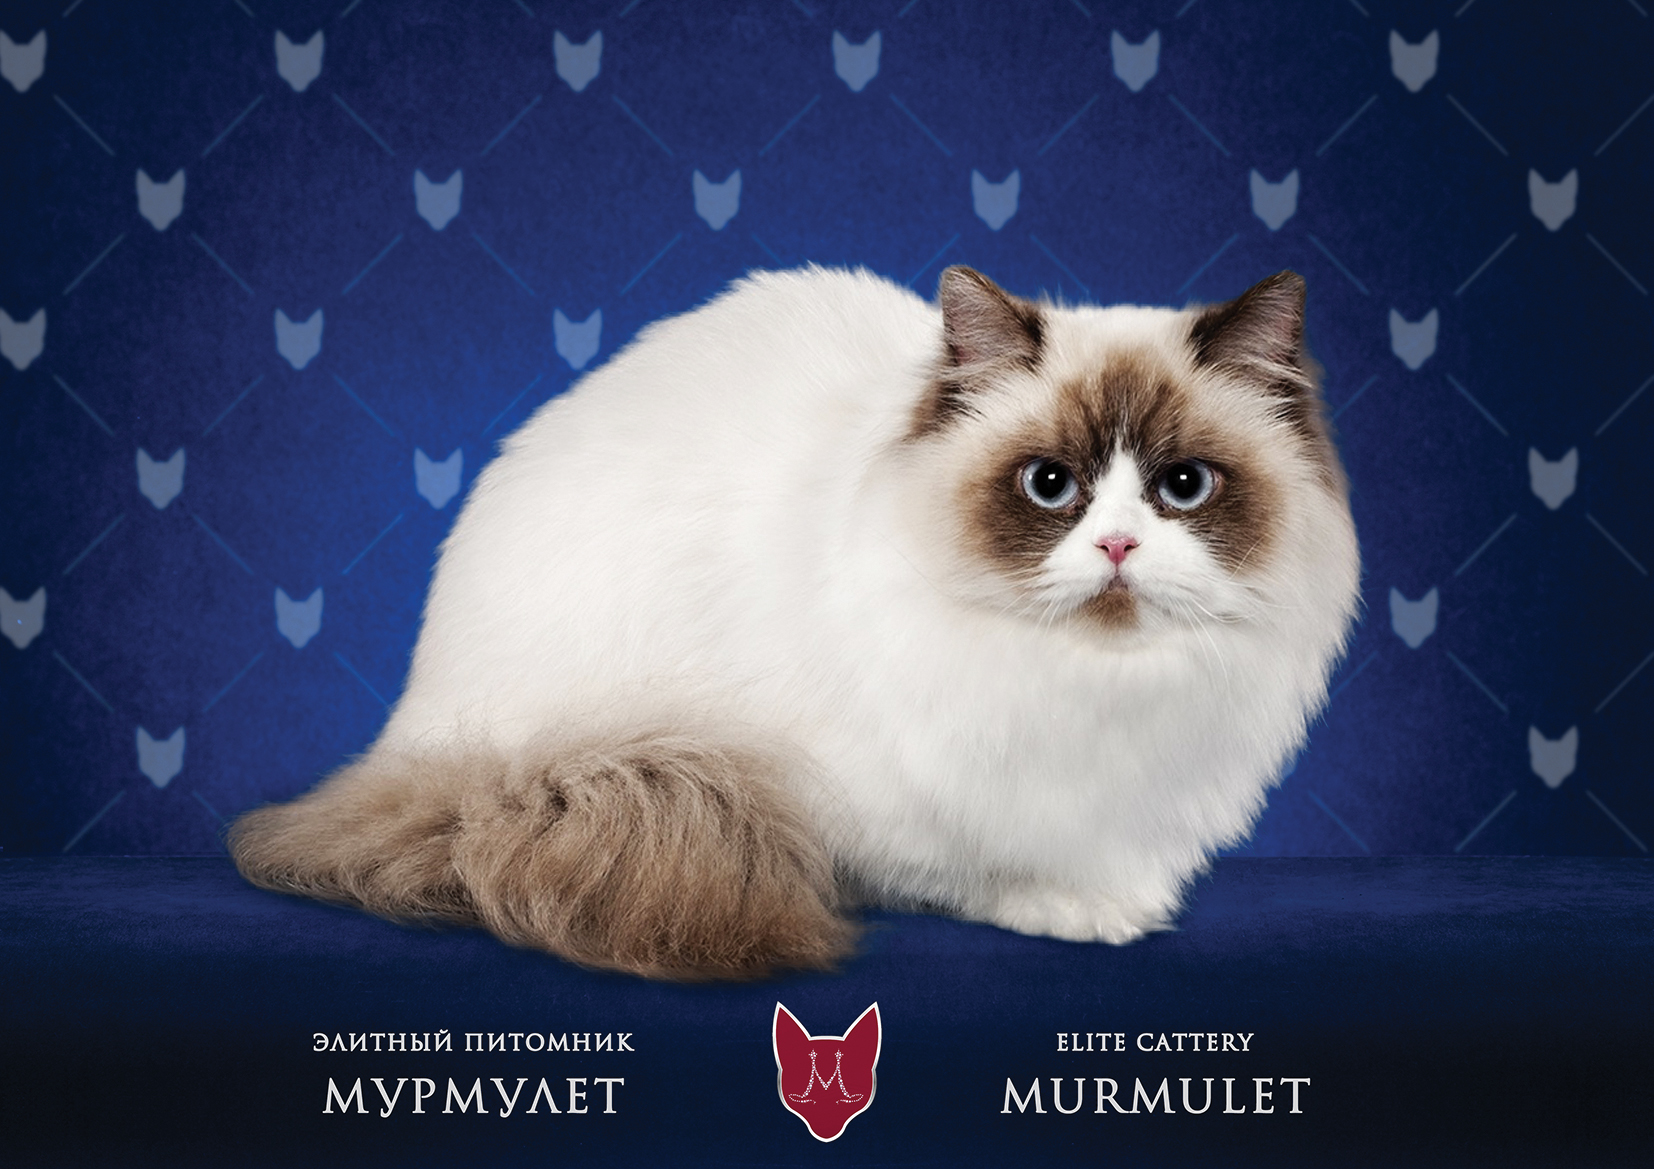 Наполеон-Минуэт Мурмулет